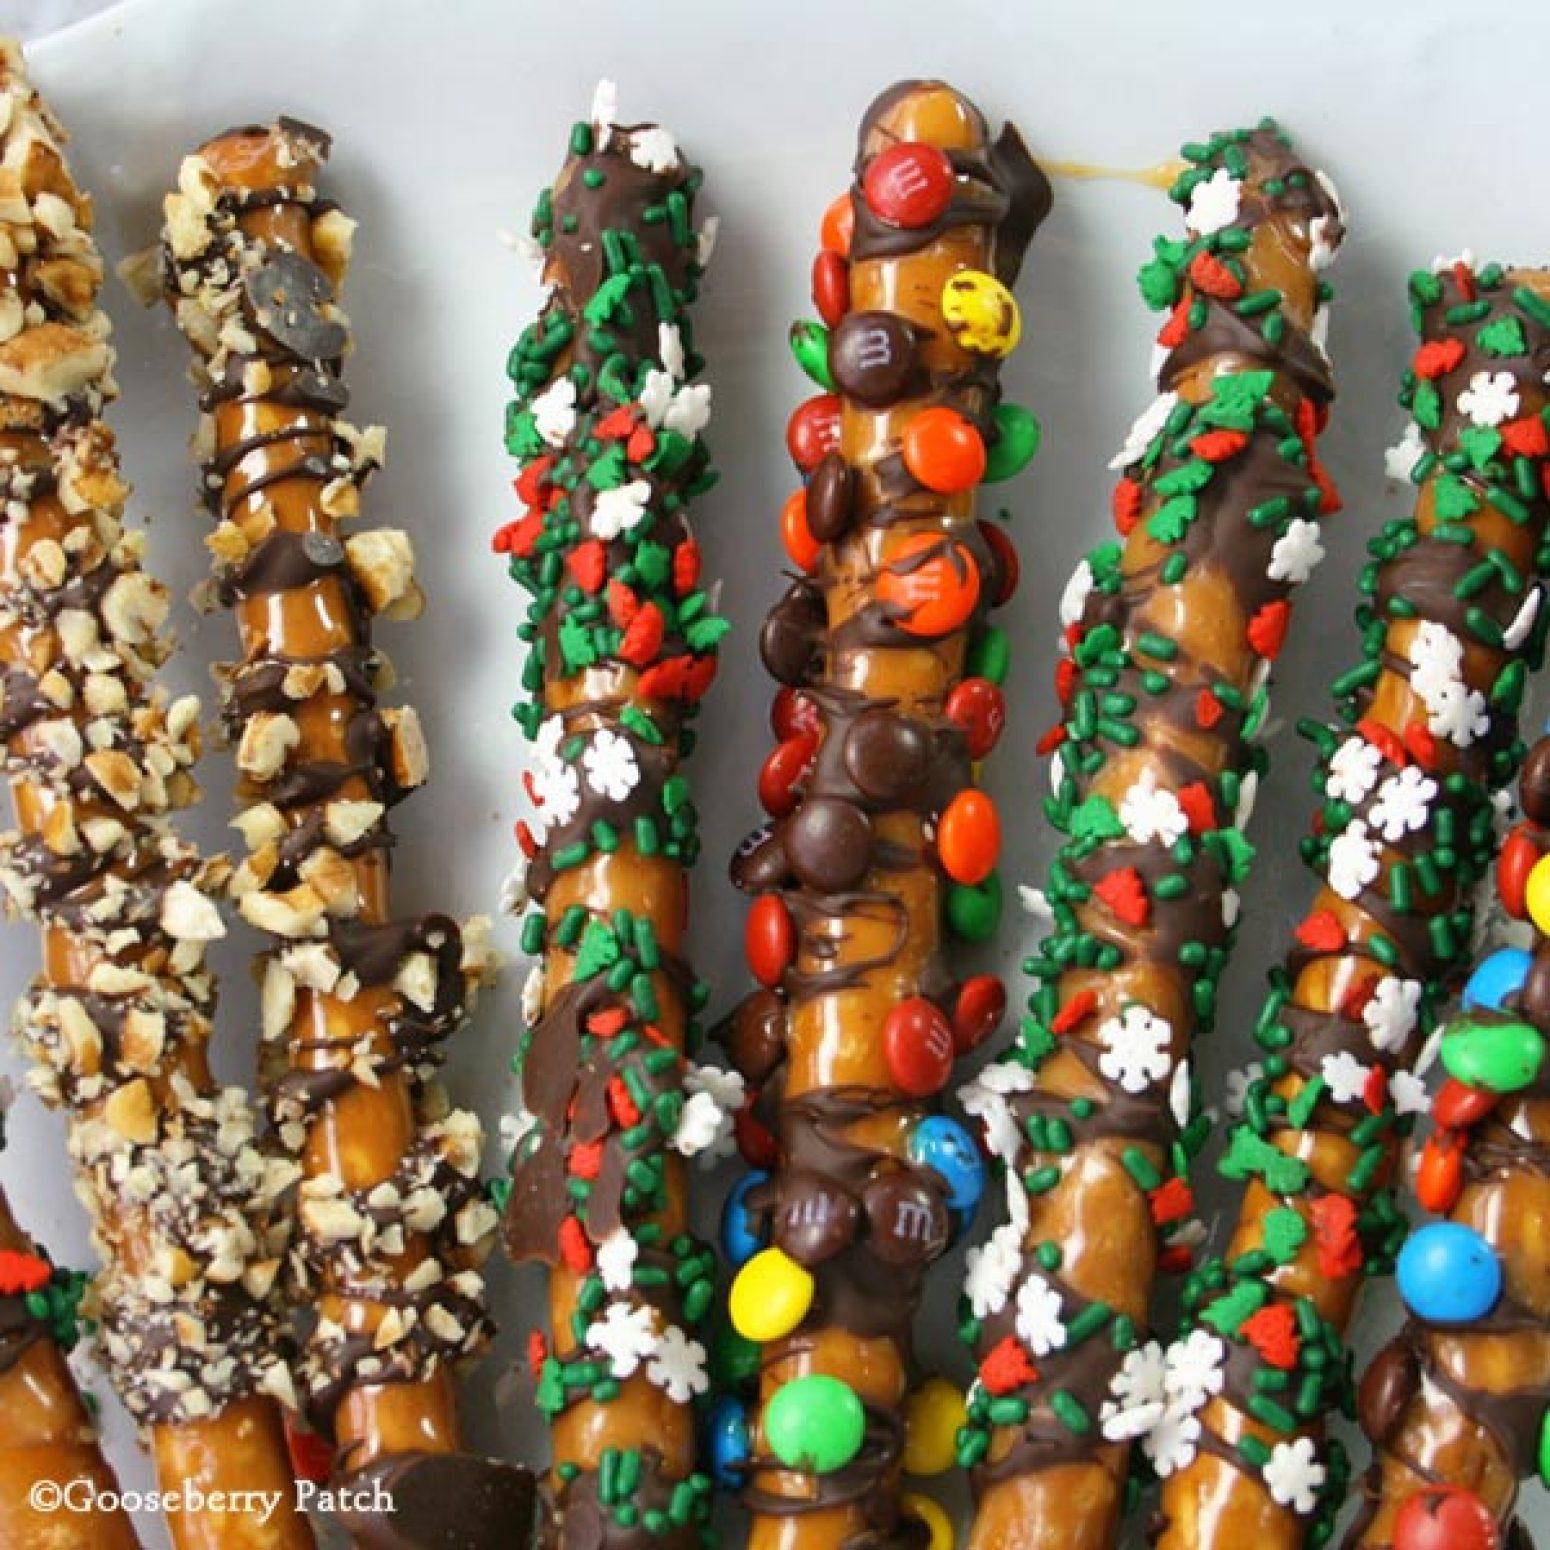 Chocolate Pretzel Logs Dunmore Candy Kitchen: CaramelChocolate Pretzel Rods Recipe 2